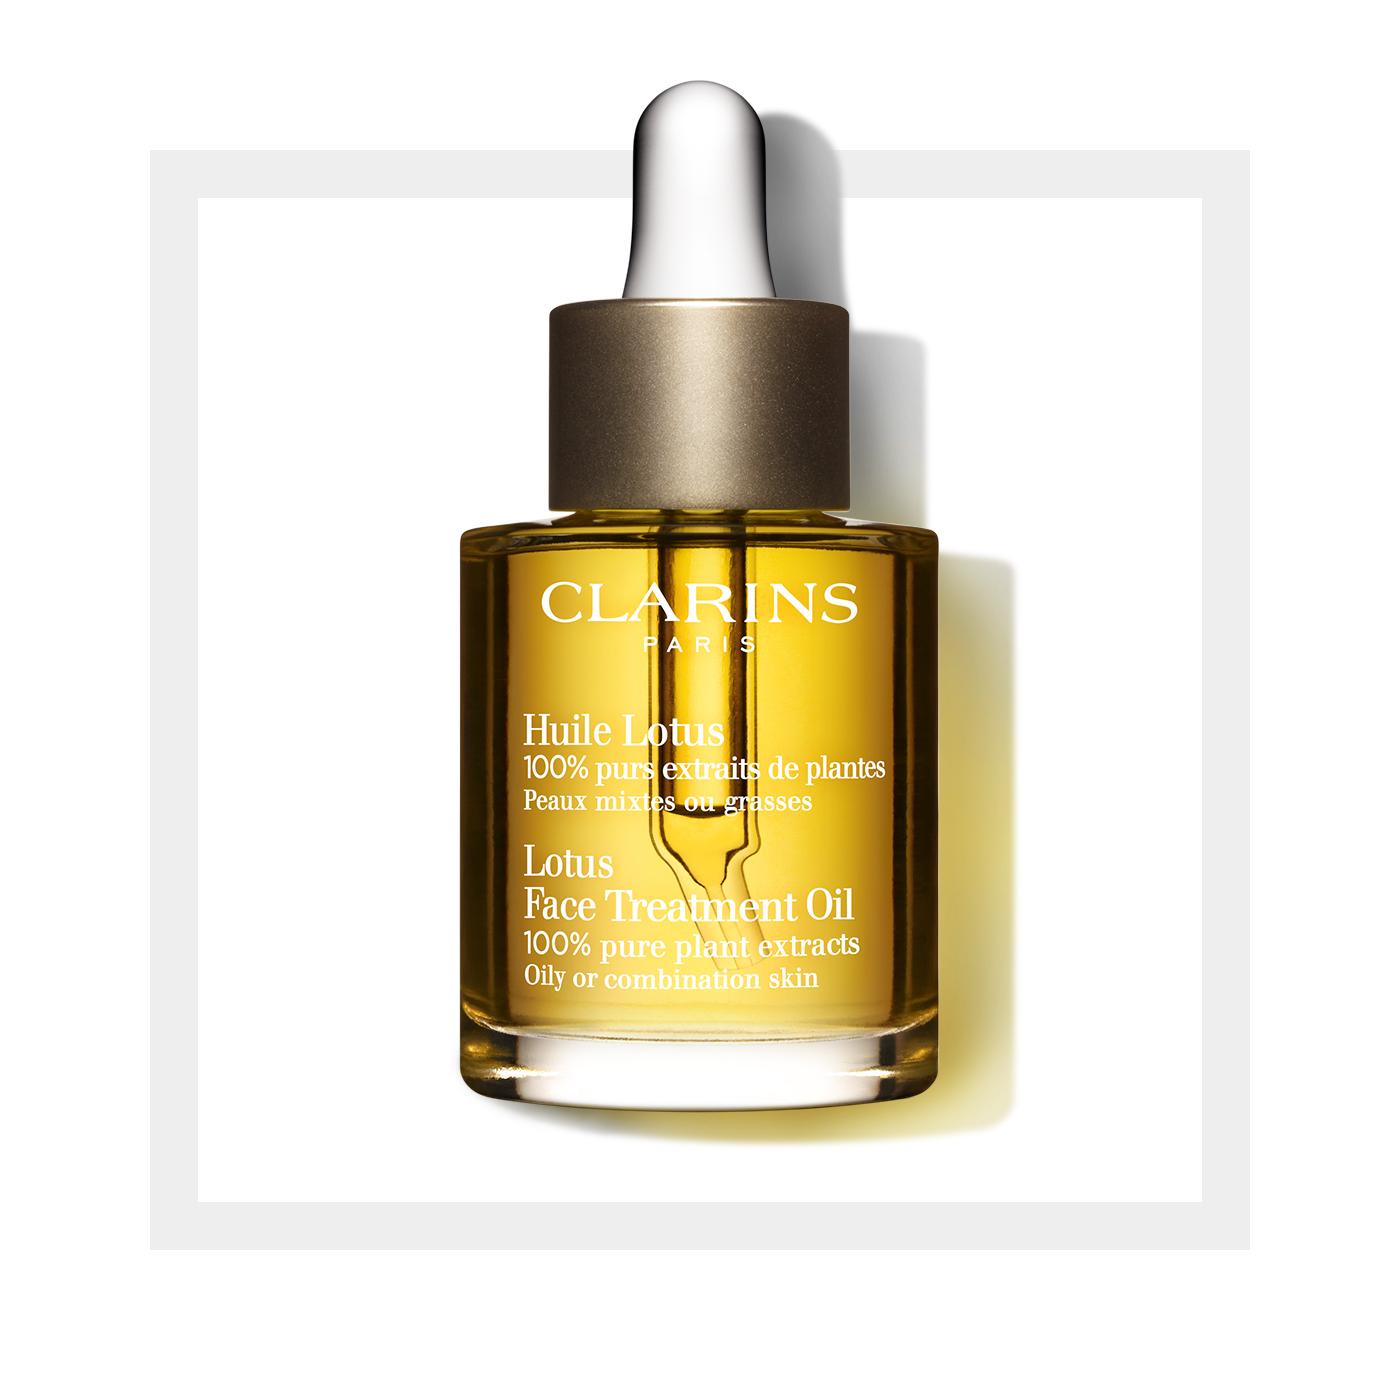 Oily Skin Lotus Cream Face Review